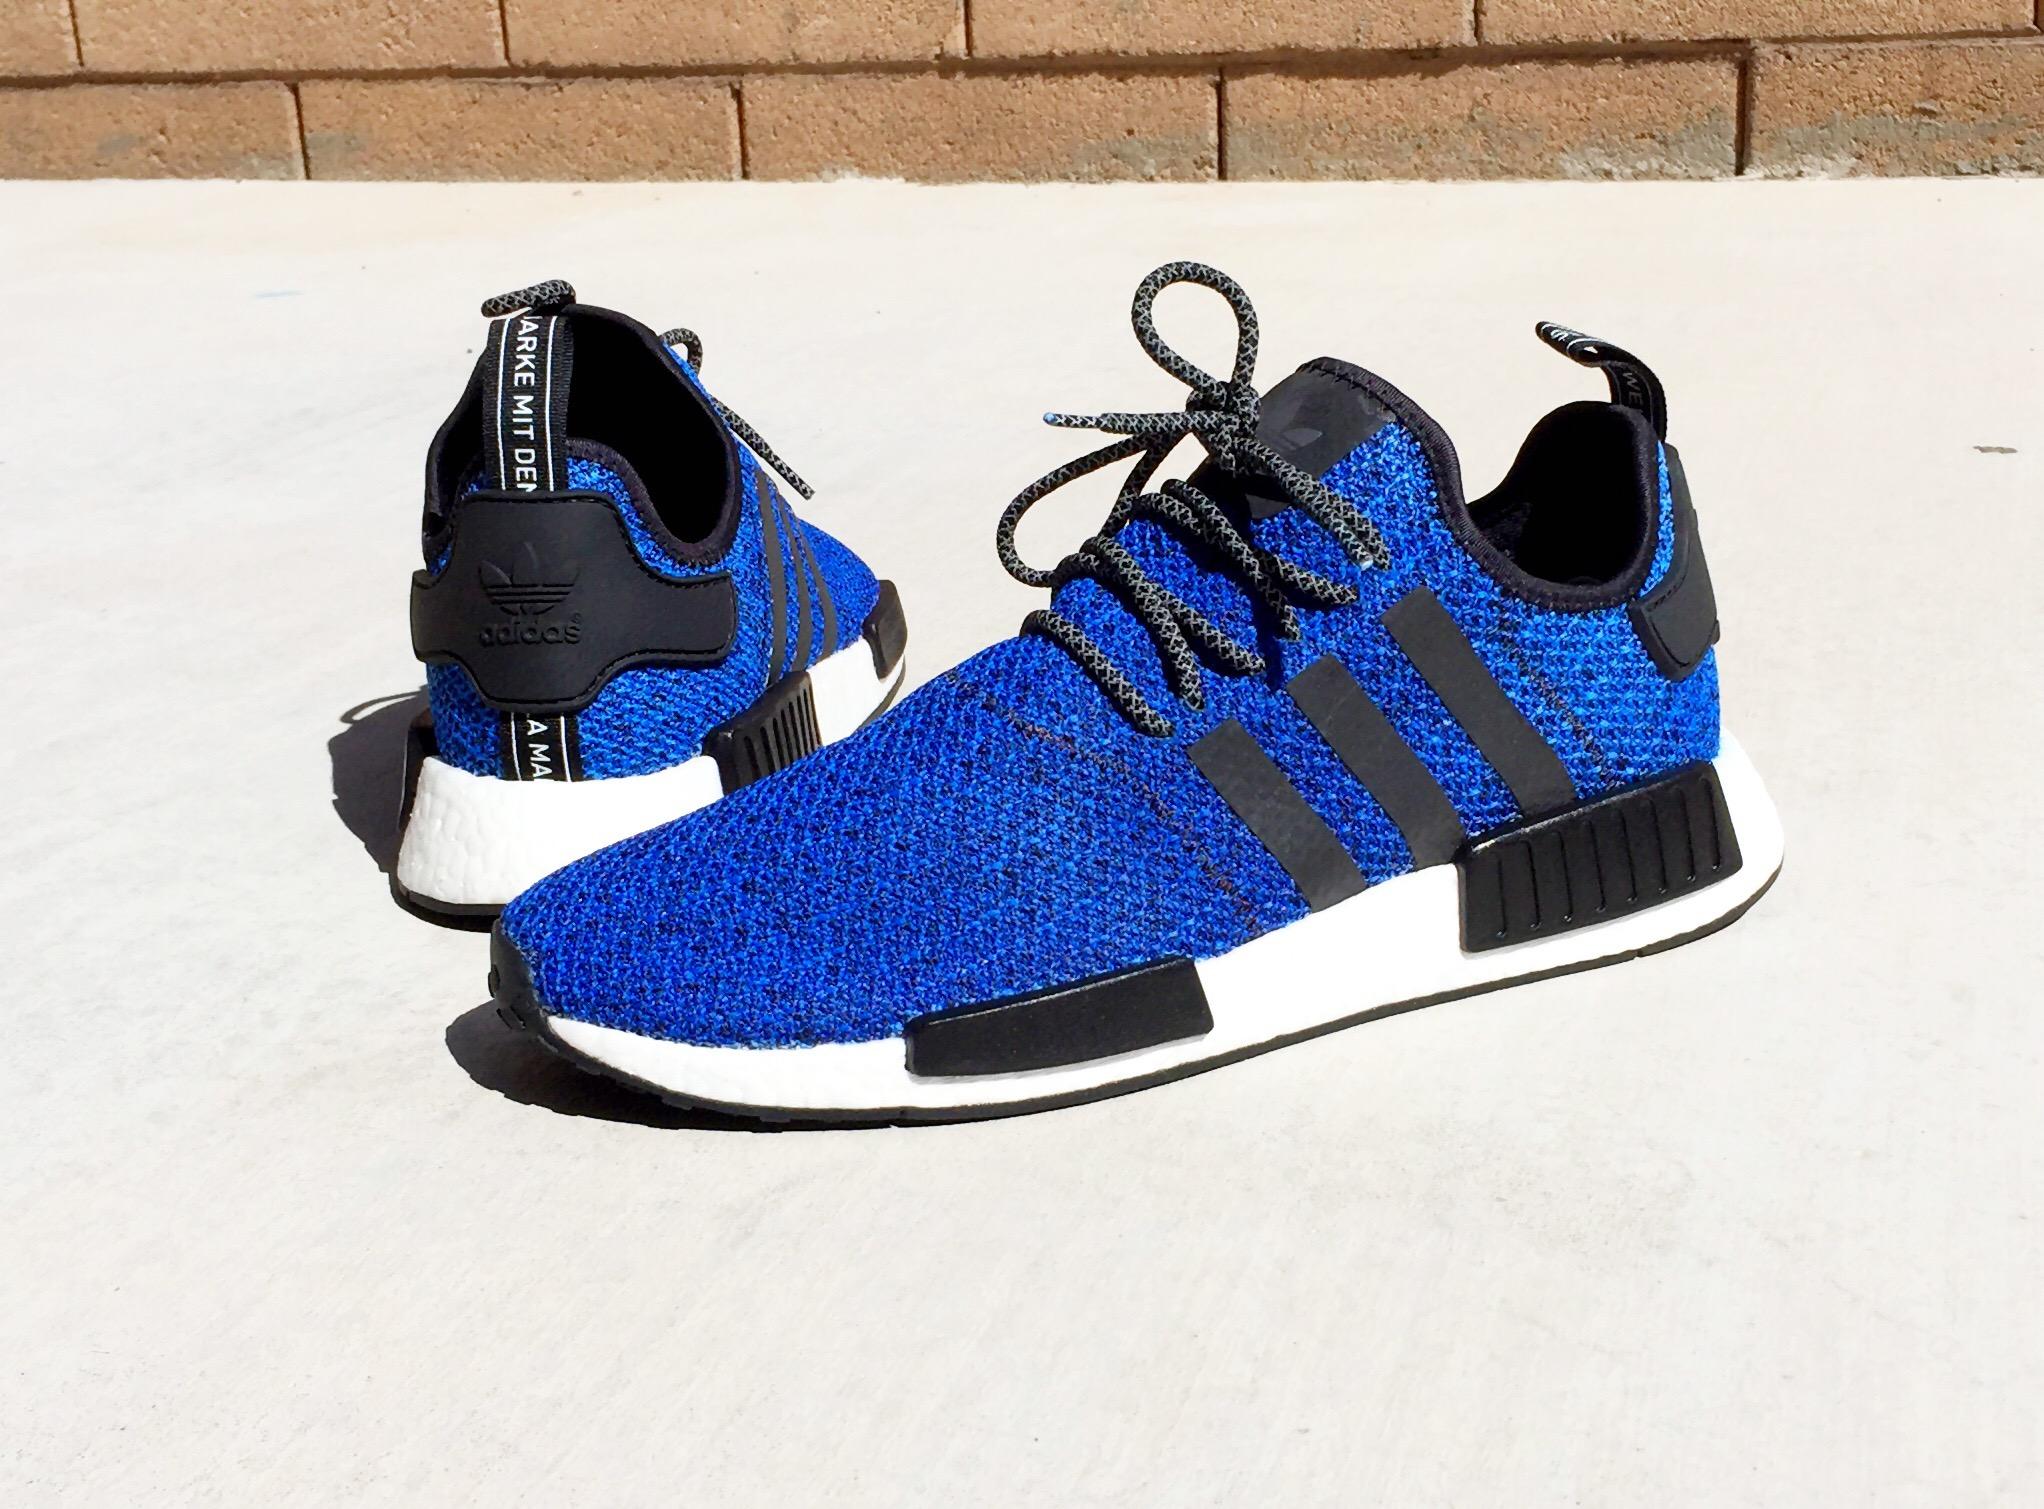 Custom Adidas NMD Royal Blue Champs